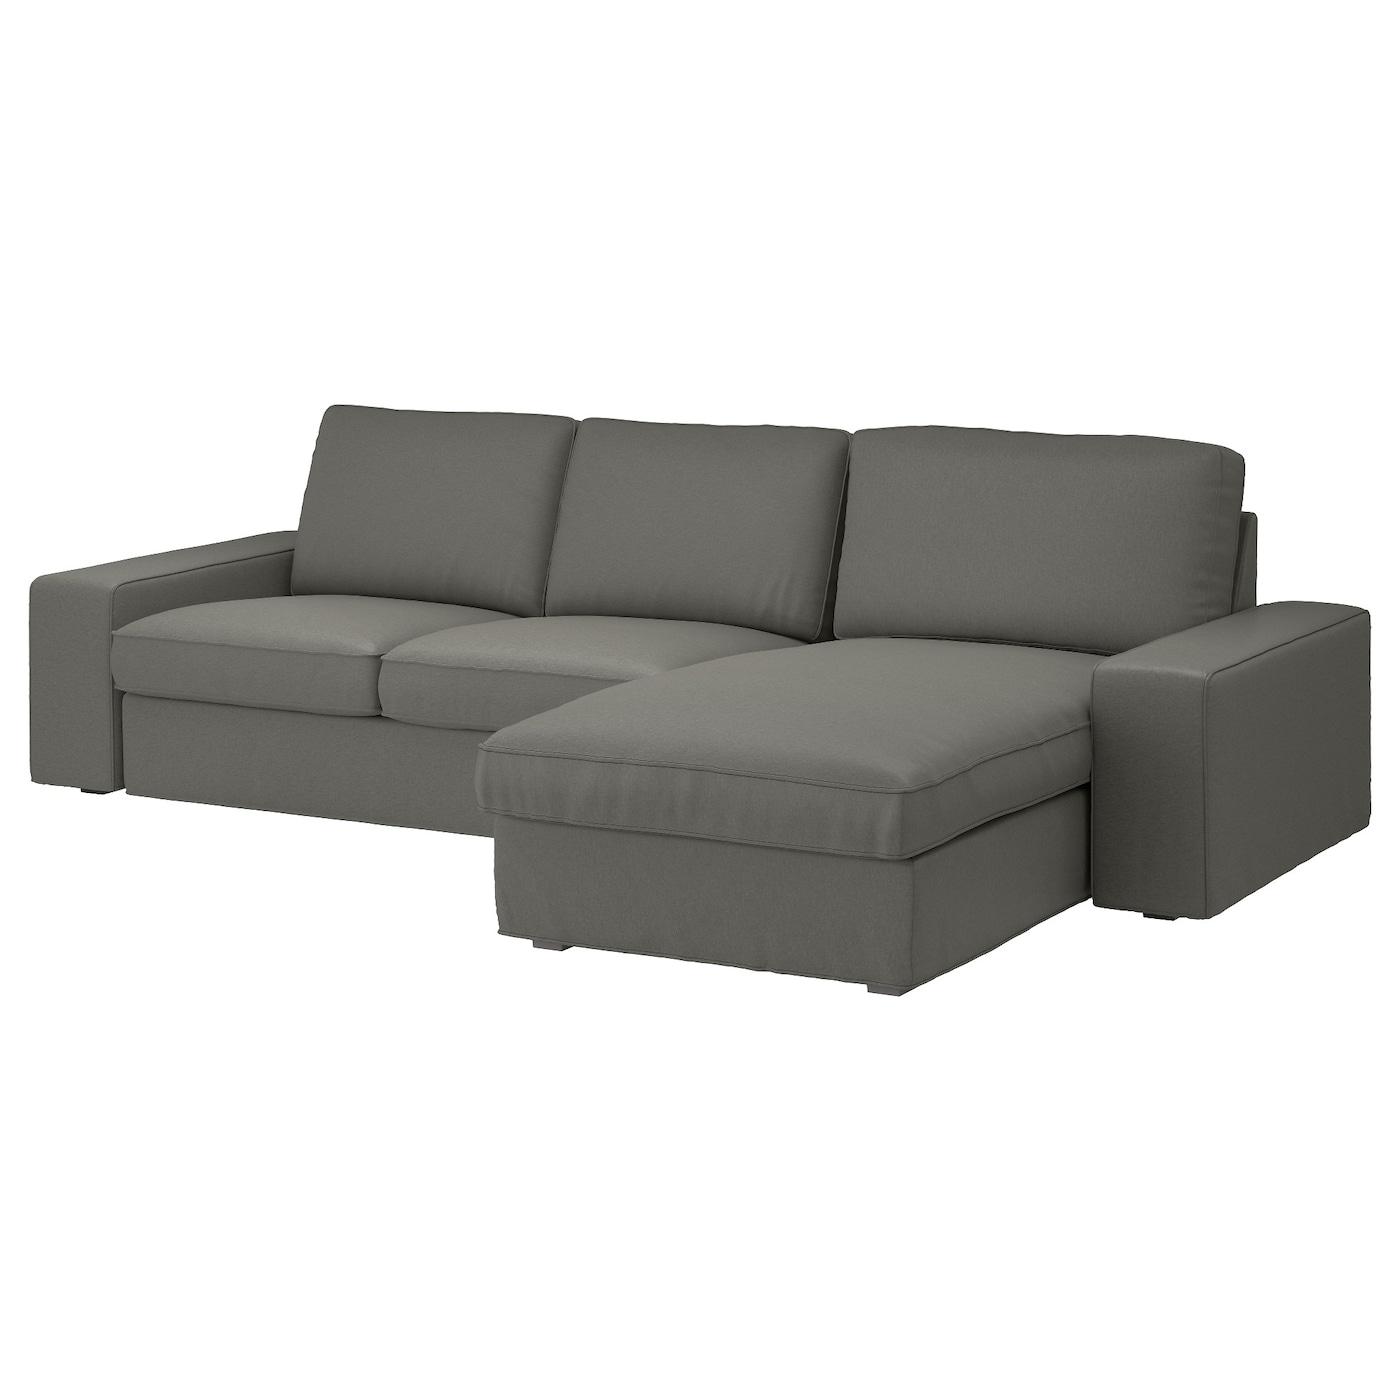 Kivik 3 Seat Sofa With Chaise Longue Borred Grey Green Ikea